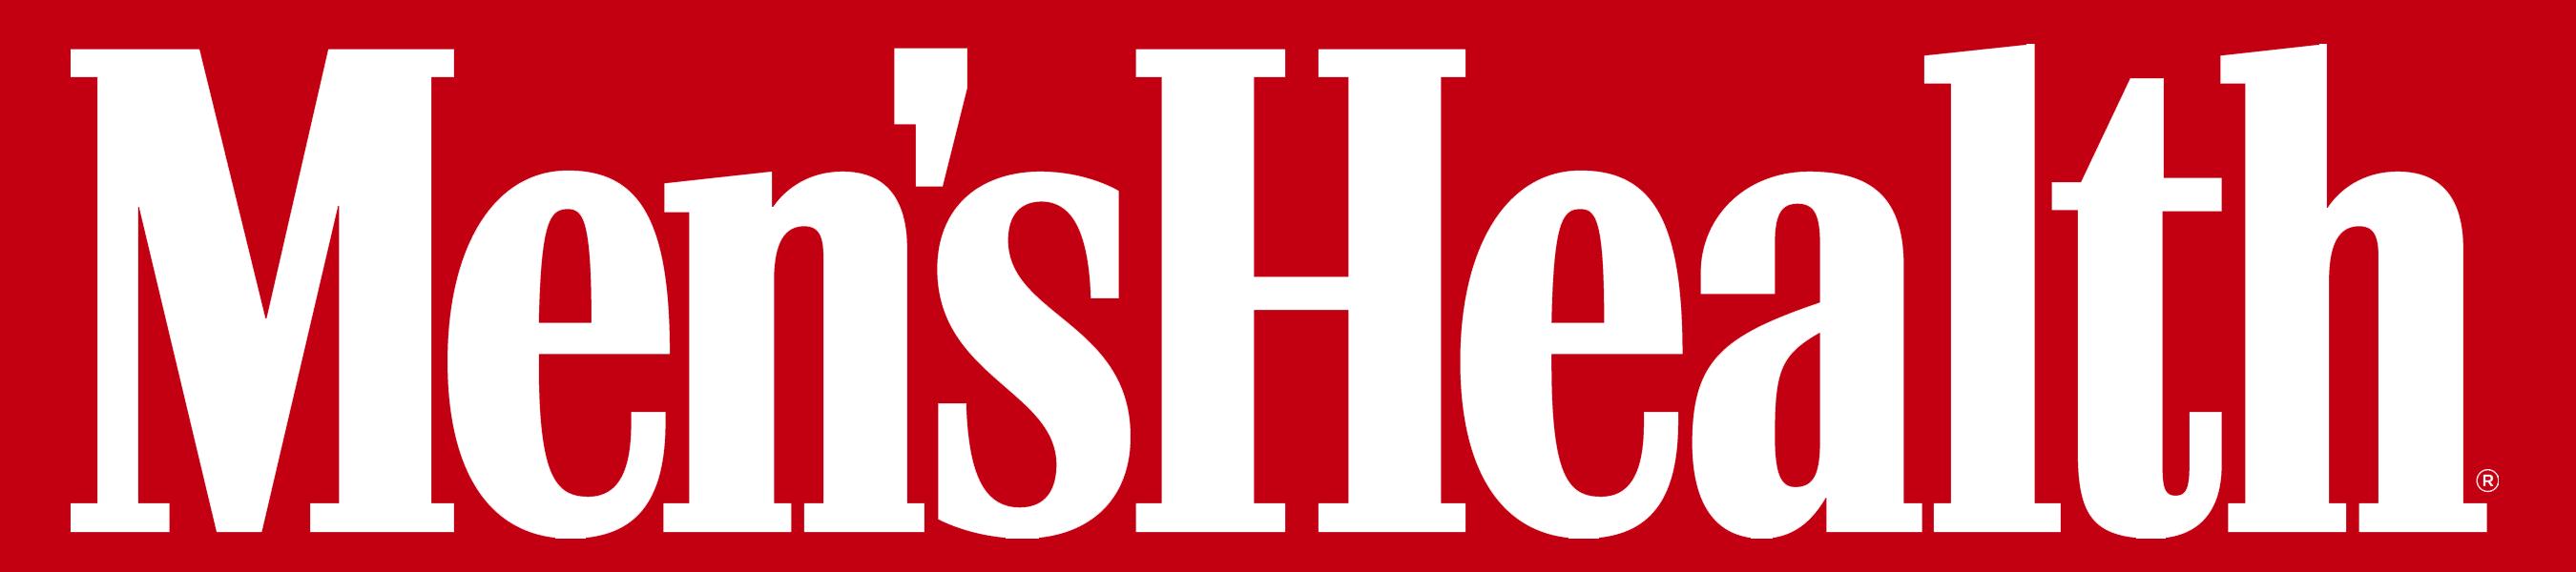 Mens Health Logo Reg